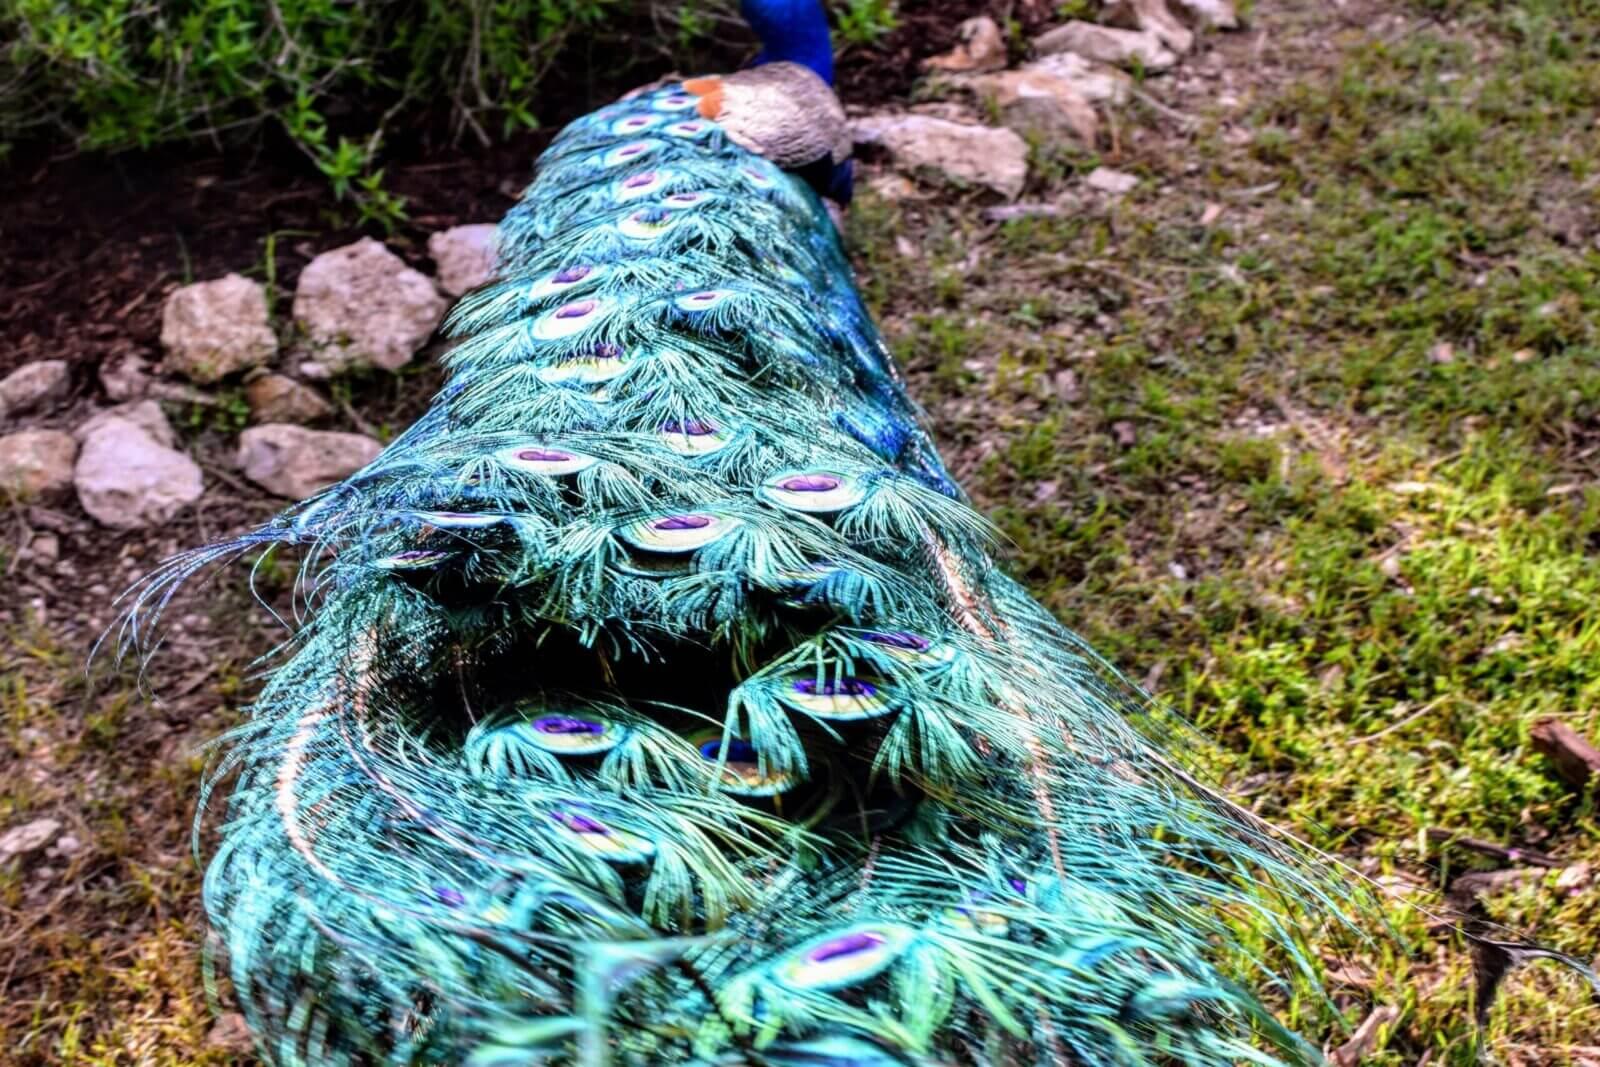 Austin peacock tail